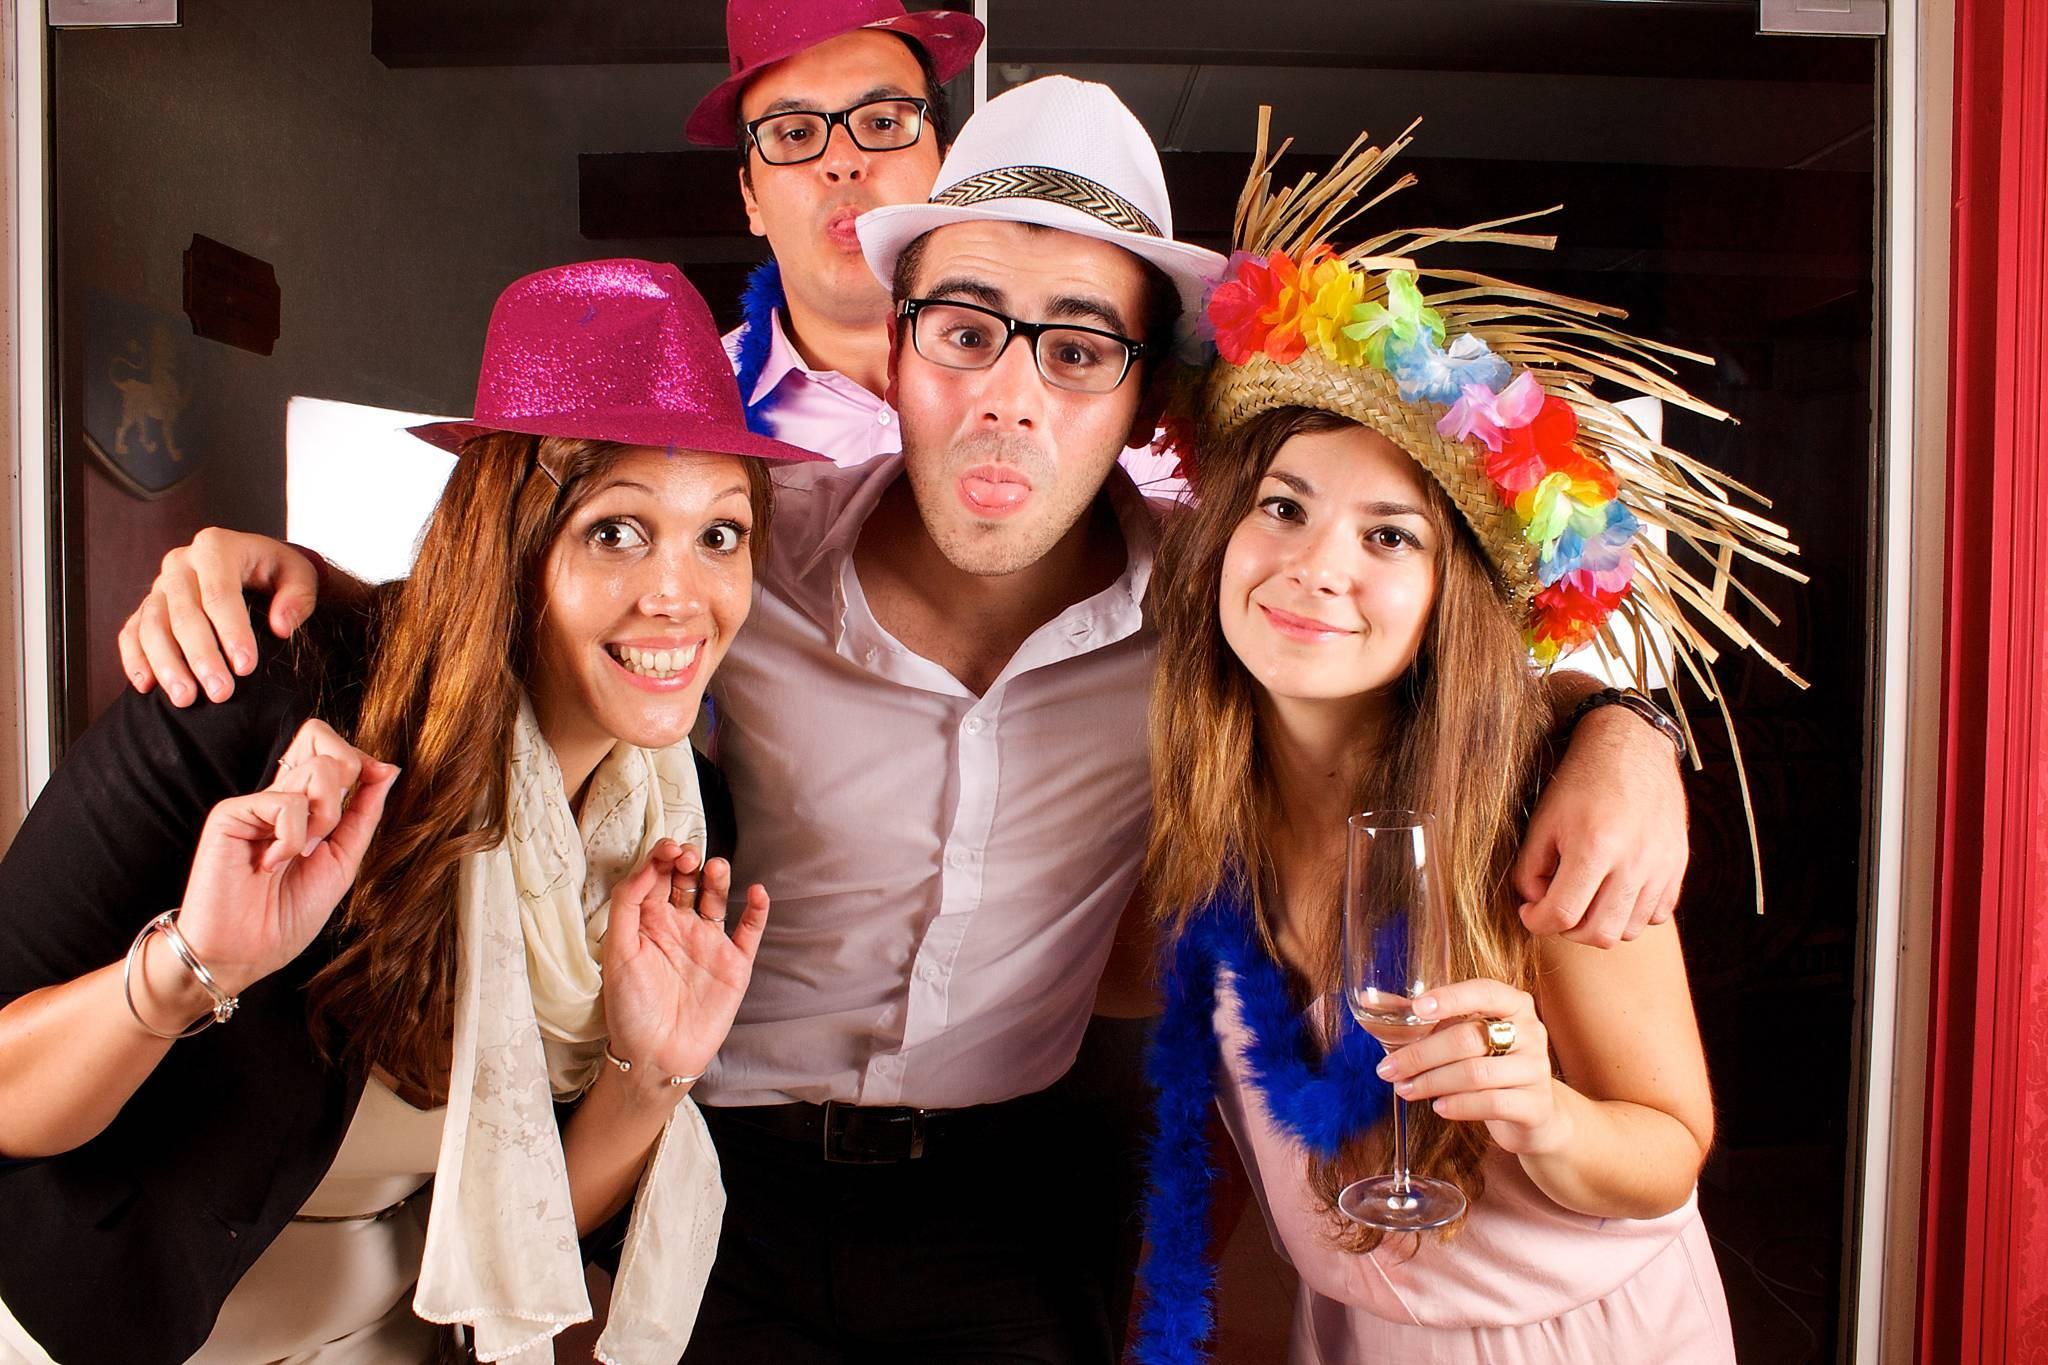 06_photobooth-mariage-bordeaux-gironde-dordogne-charentes-alexandre-roschewitz-photographies_2048px